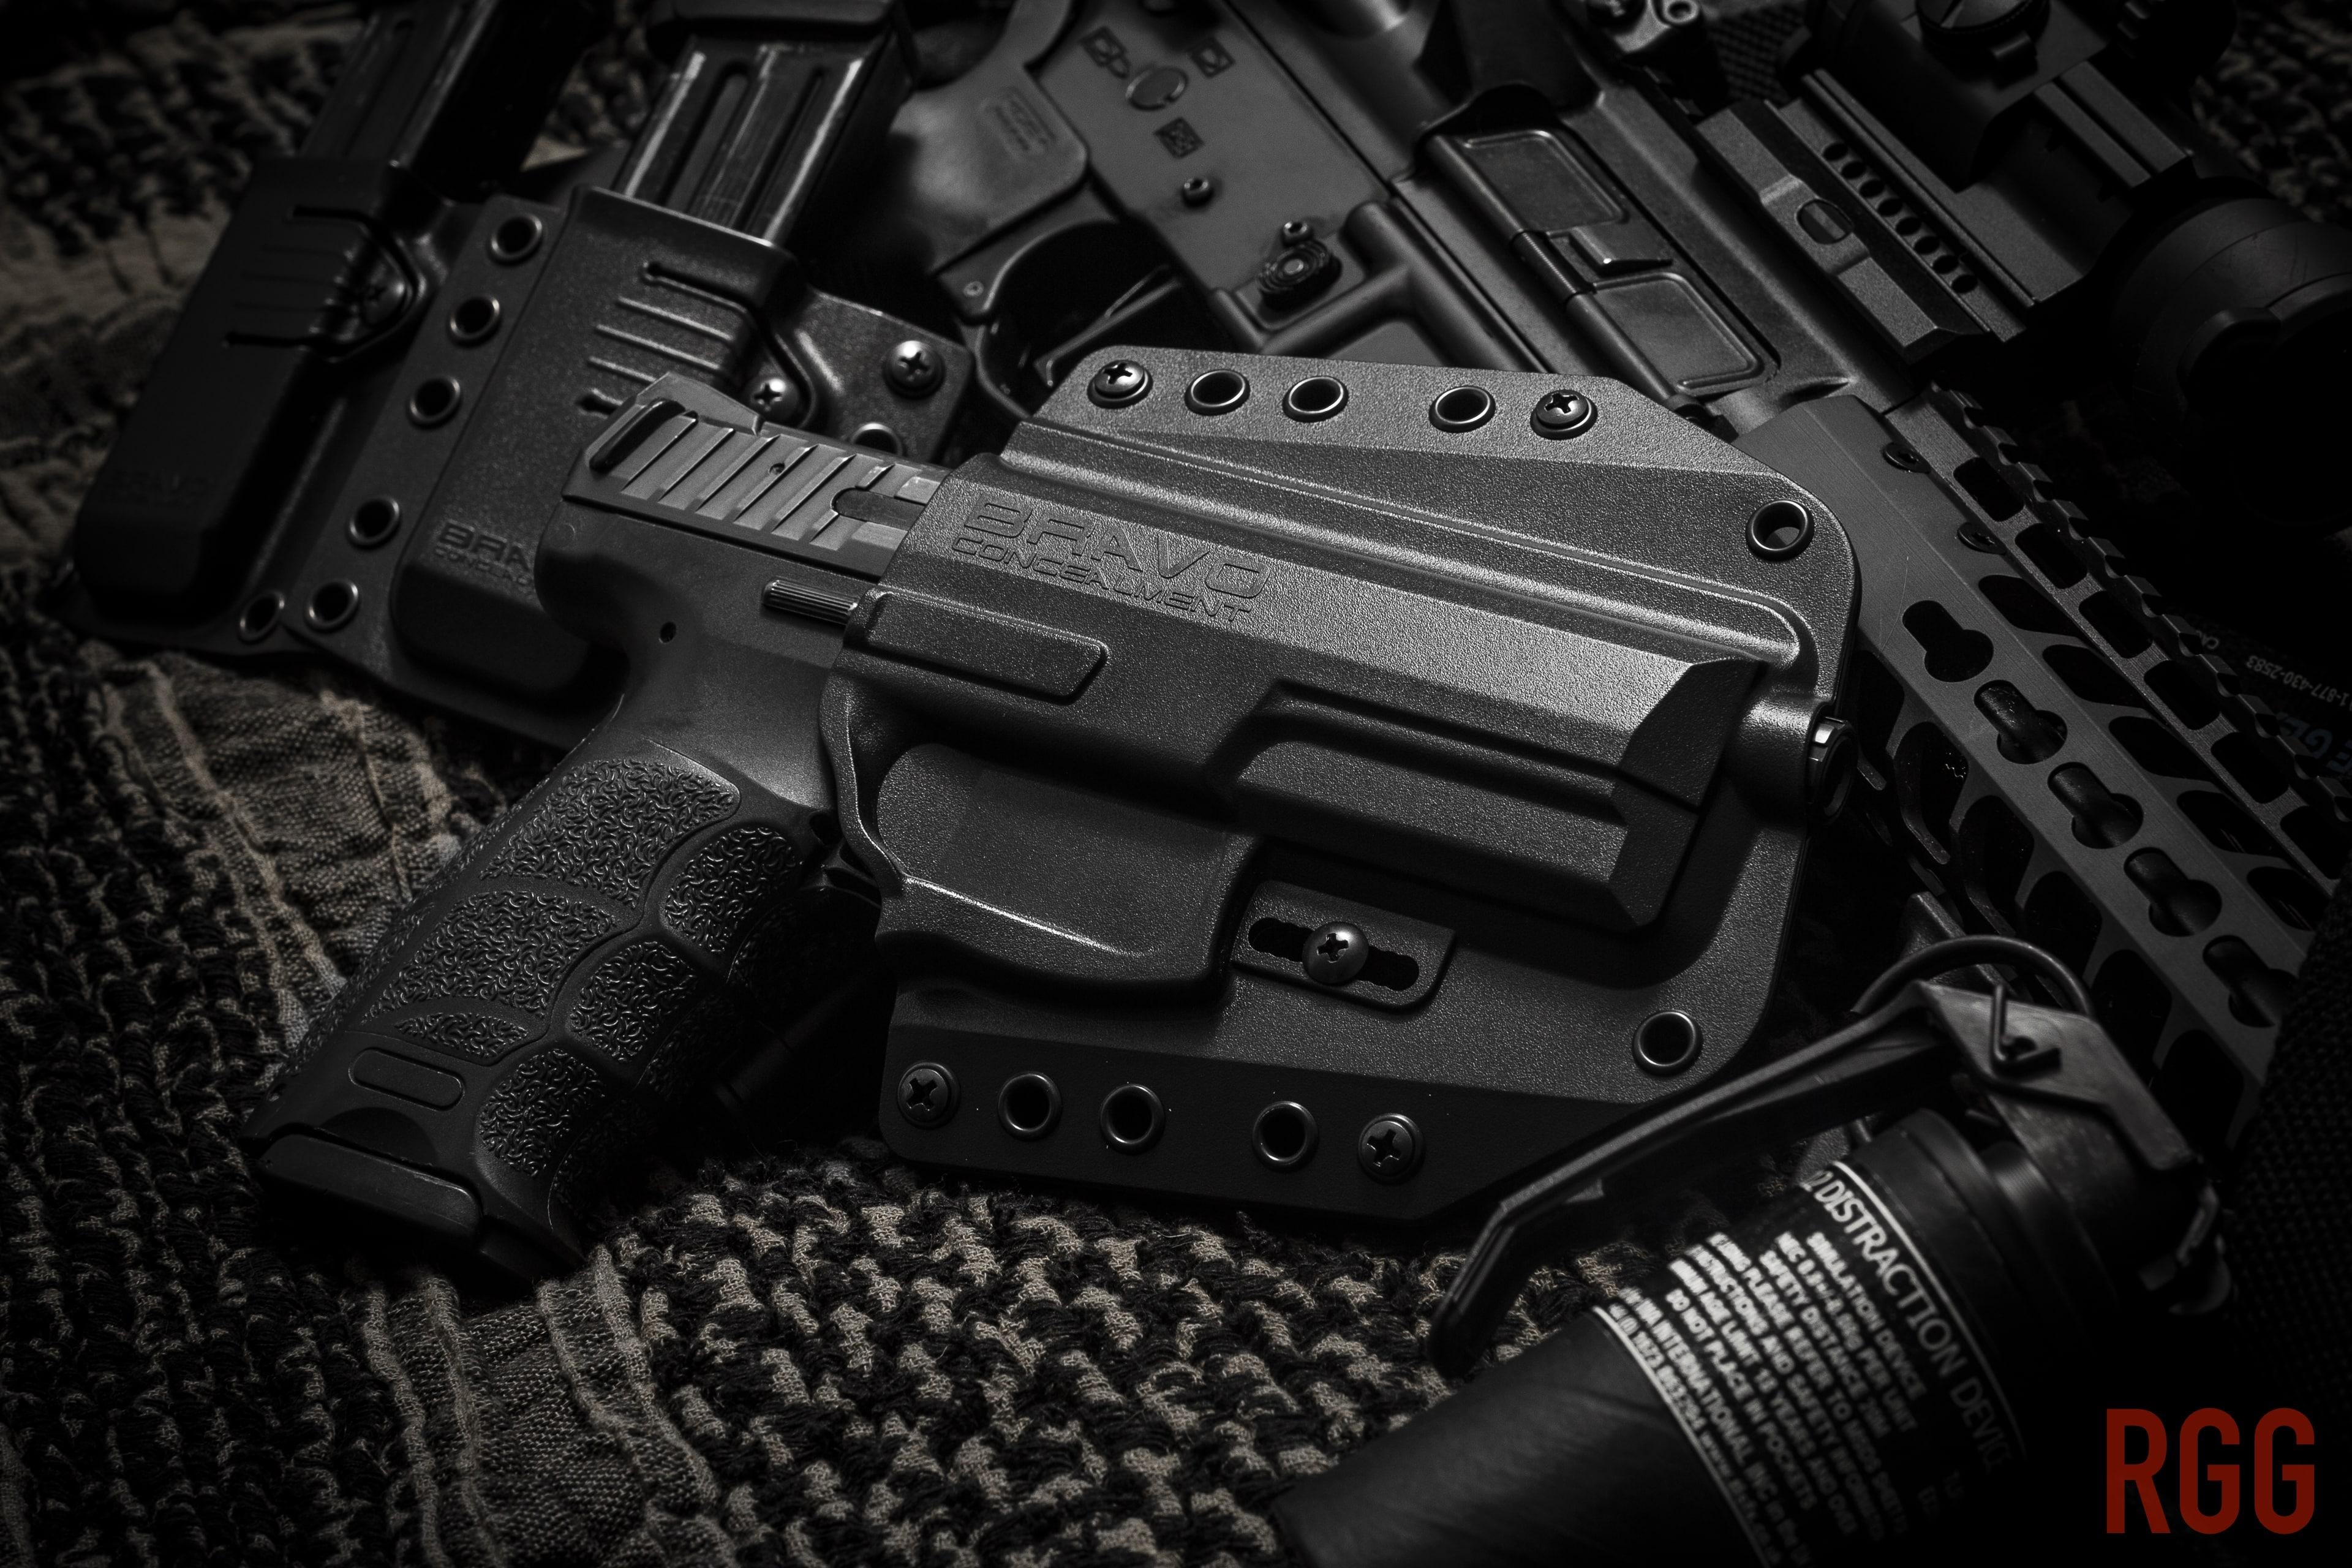 The Bravo Concealment BCA 3.0 OWB Holster for the Heckler & Koch VP9.